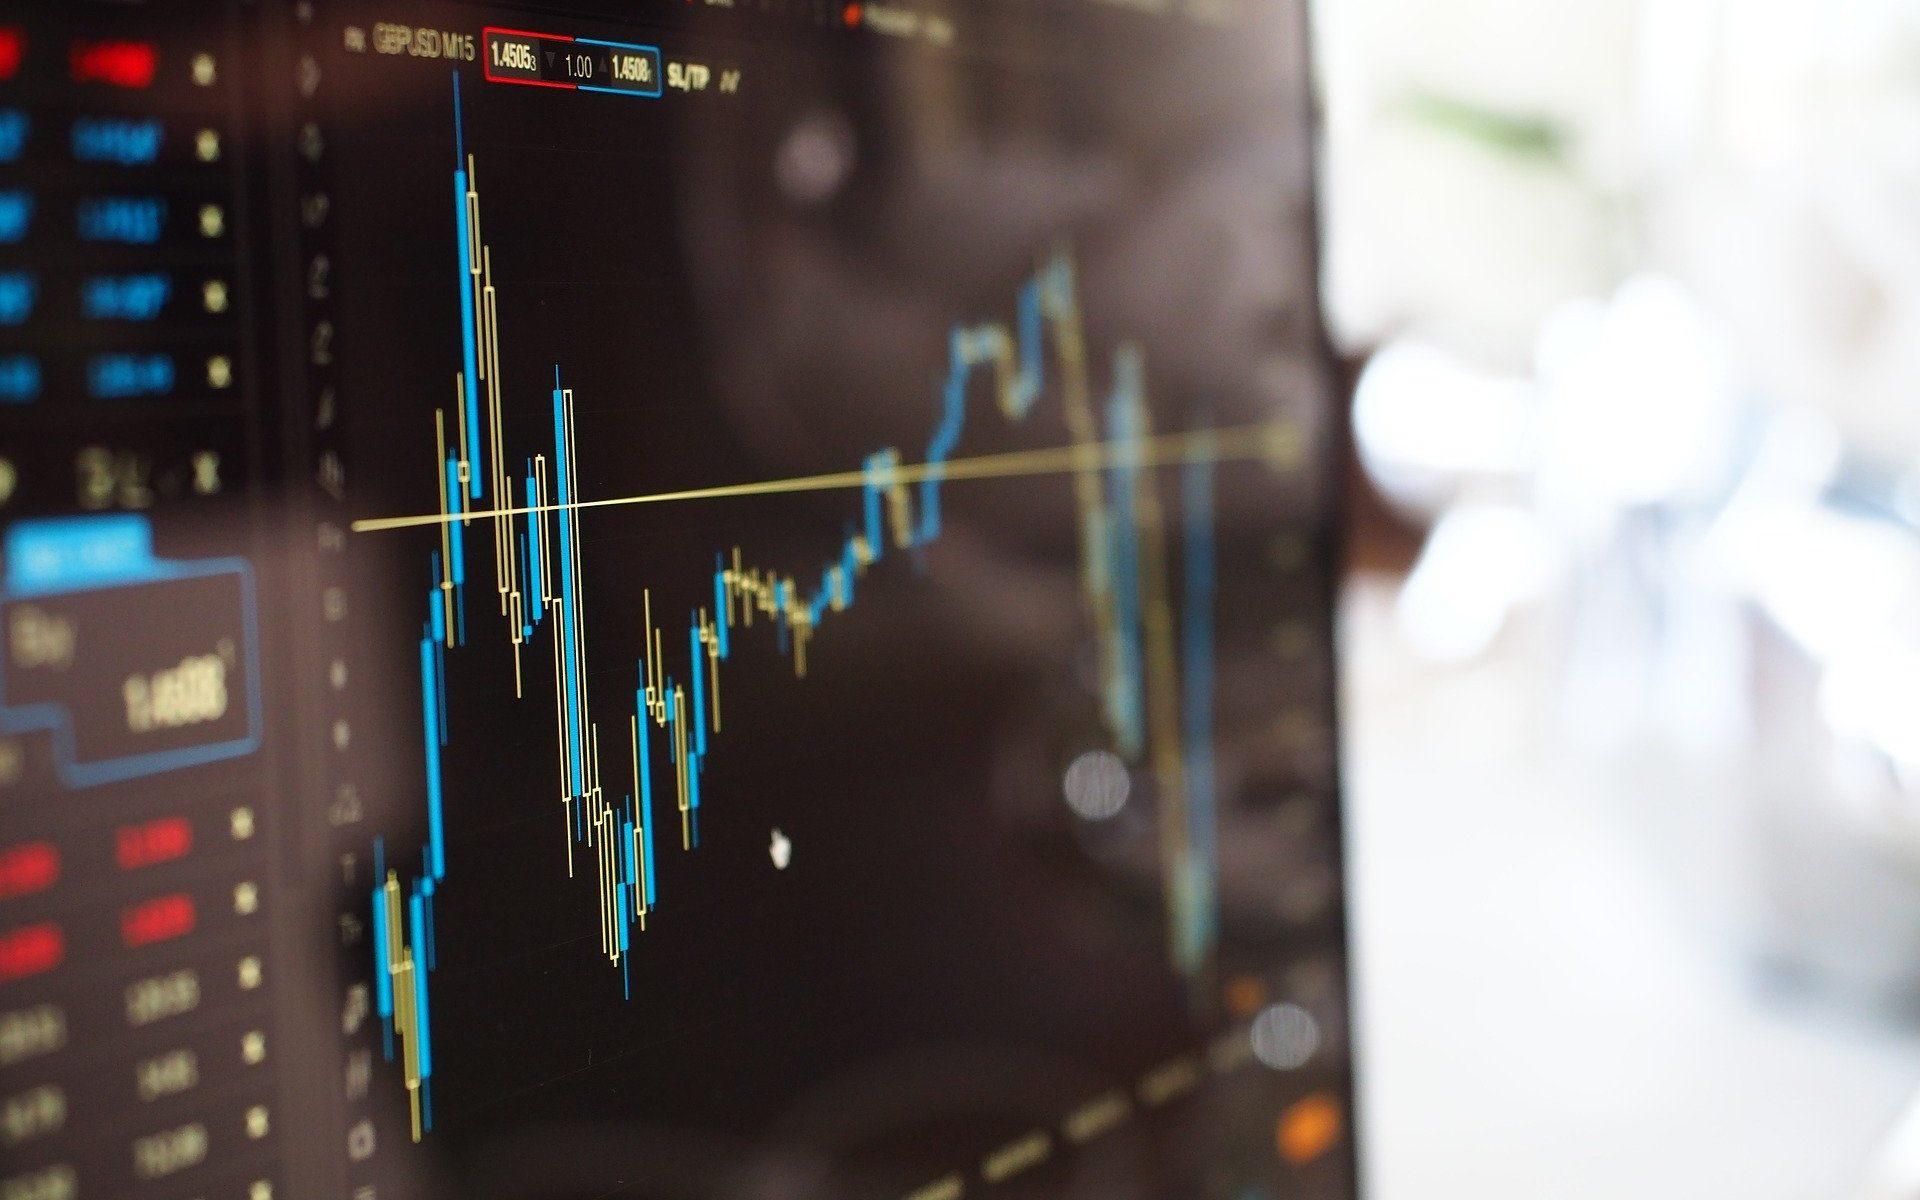 sociedades de capital riesgo